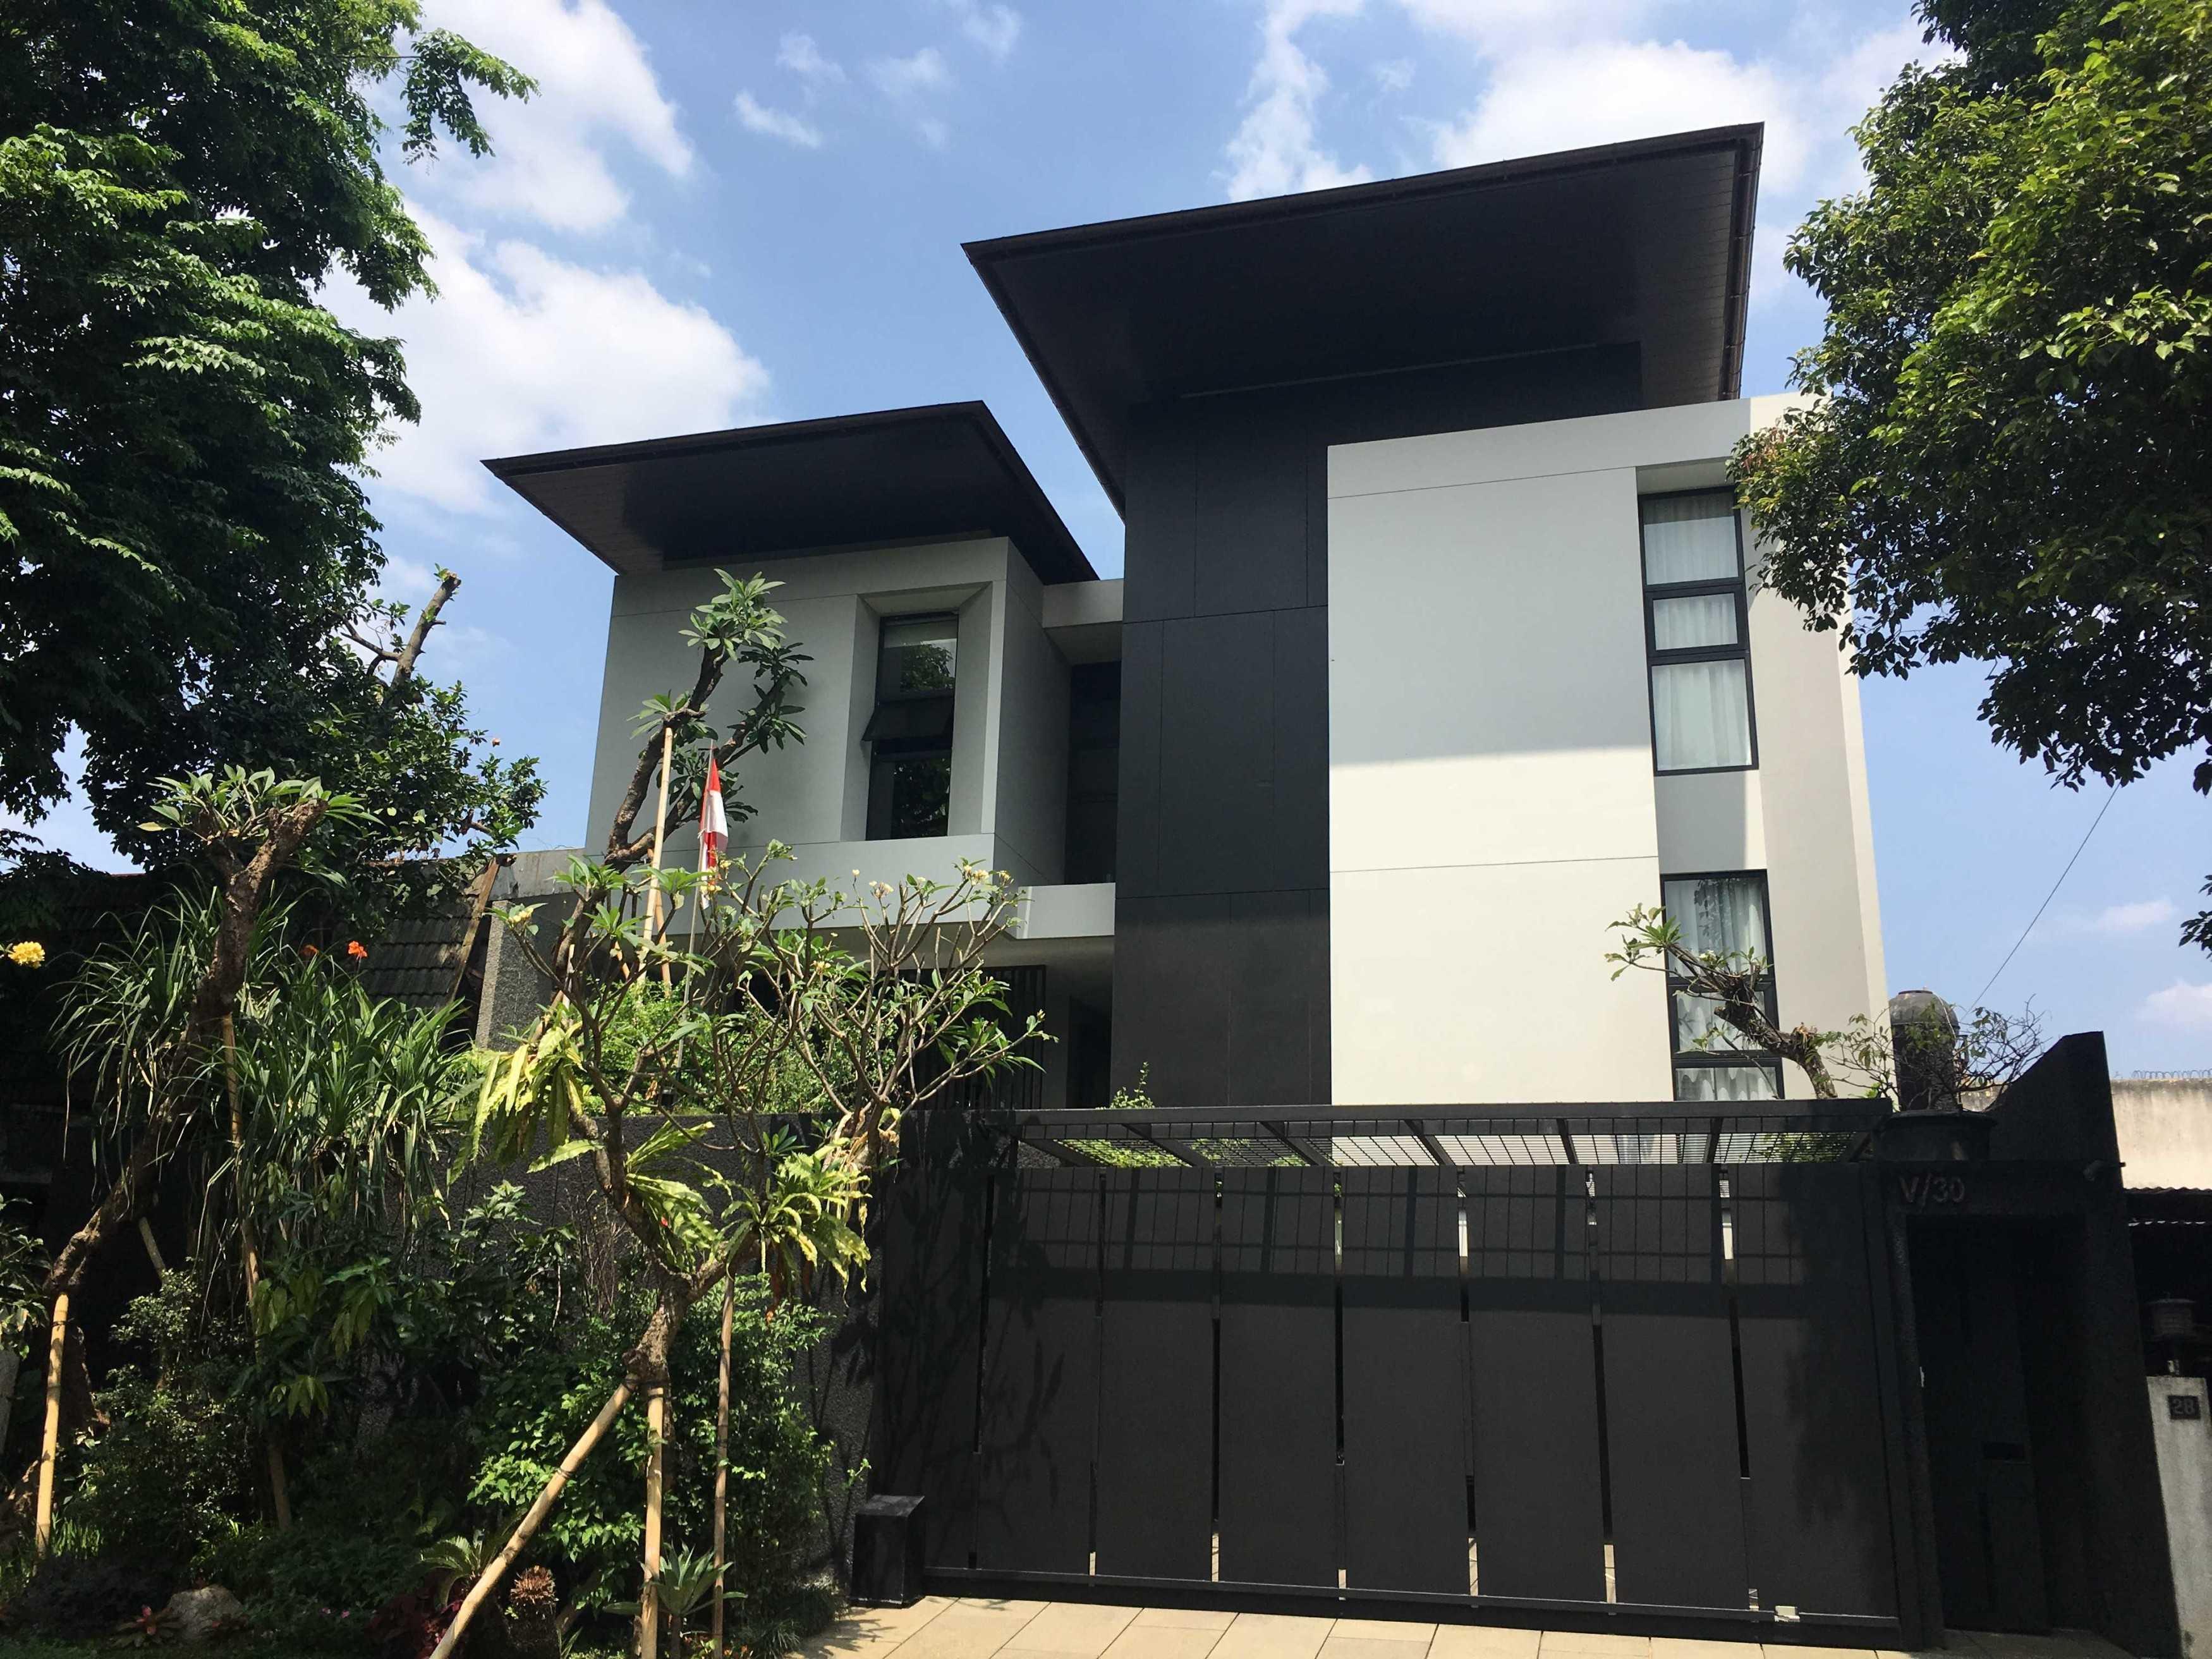 Pt. Modula The Canvas House Pondok Indah, Jakarta Pondok Indah, Jakarta Pt-Modula-The-Canvas-House   60234